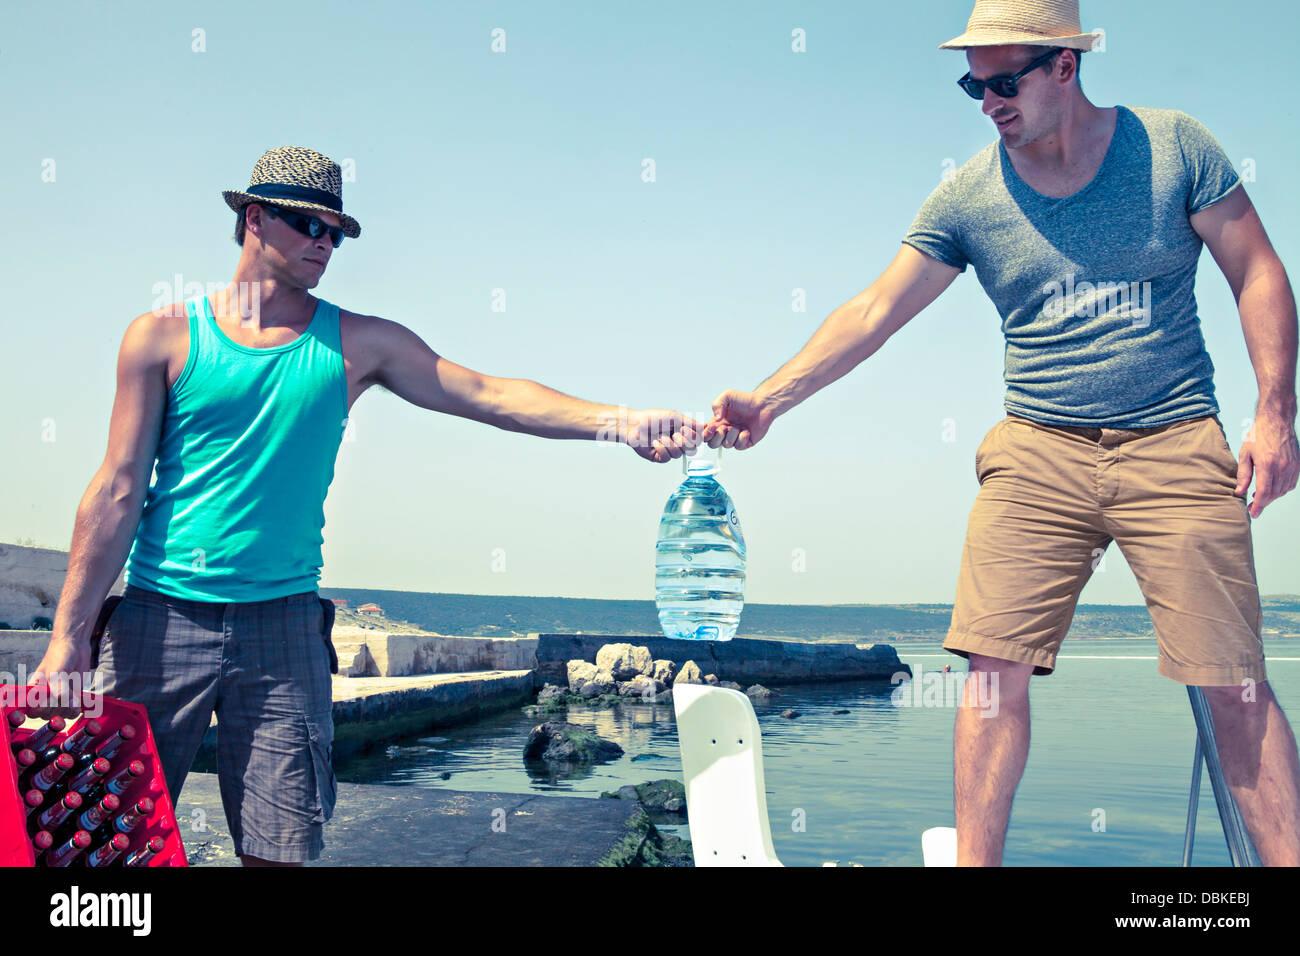 Kroatien, Dalmatien, junge Männer am Meer, den Transport von Bier Stockbild